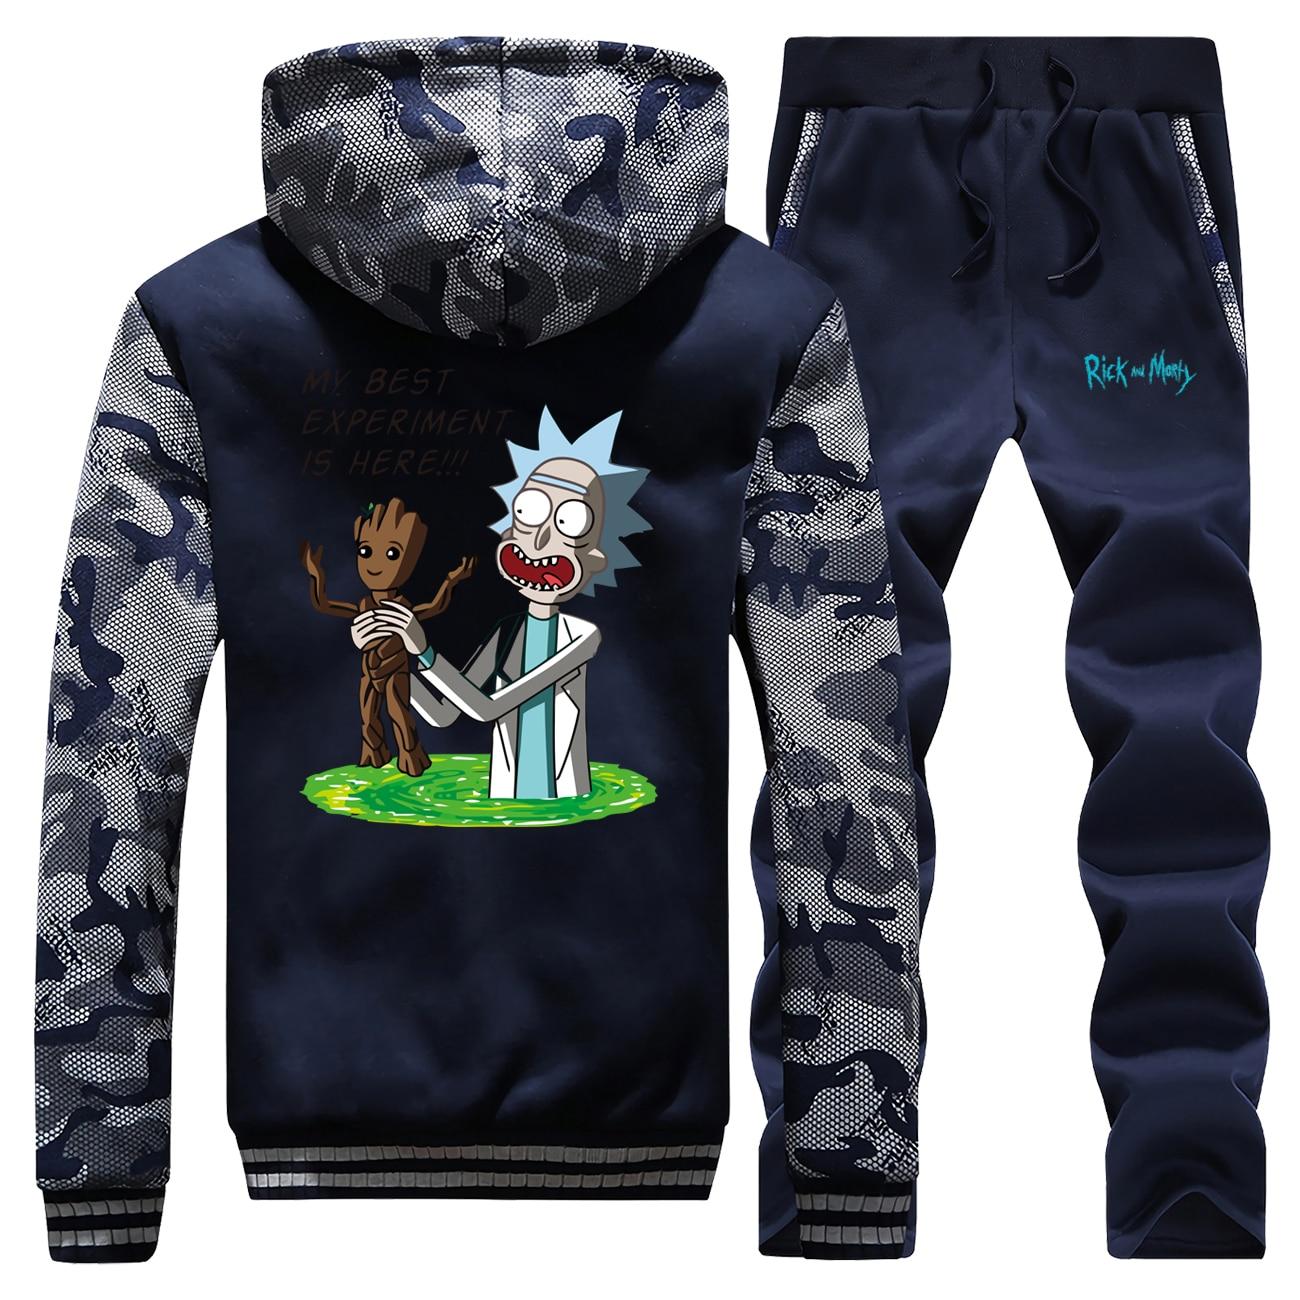 Groot Rick And Morty Streetwear Mens Hoodies Camouflage Raglan Winter 2019 New Coat Thick Suit Cartoon Hooded+Pants 2 Piece Set